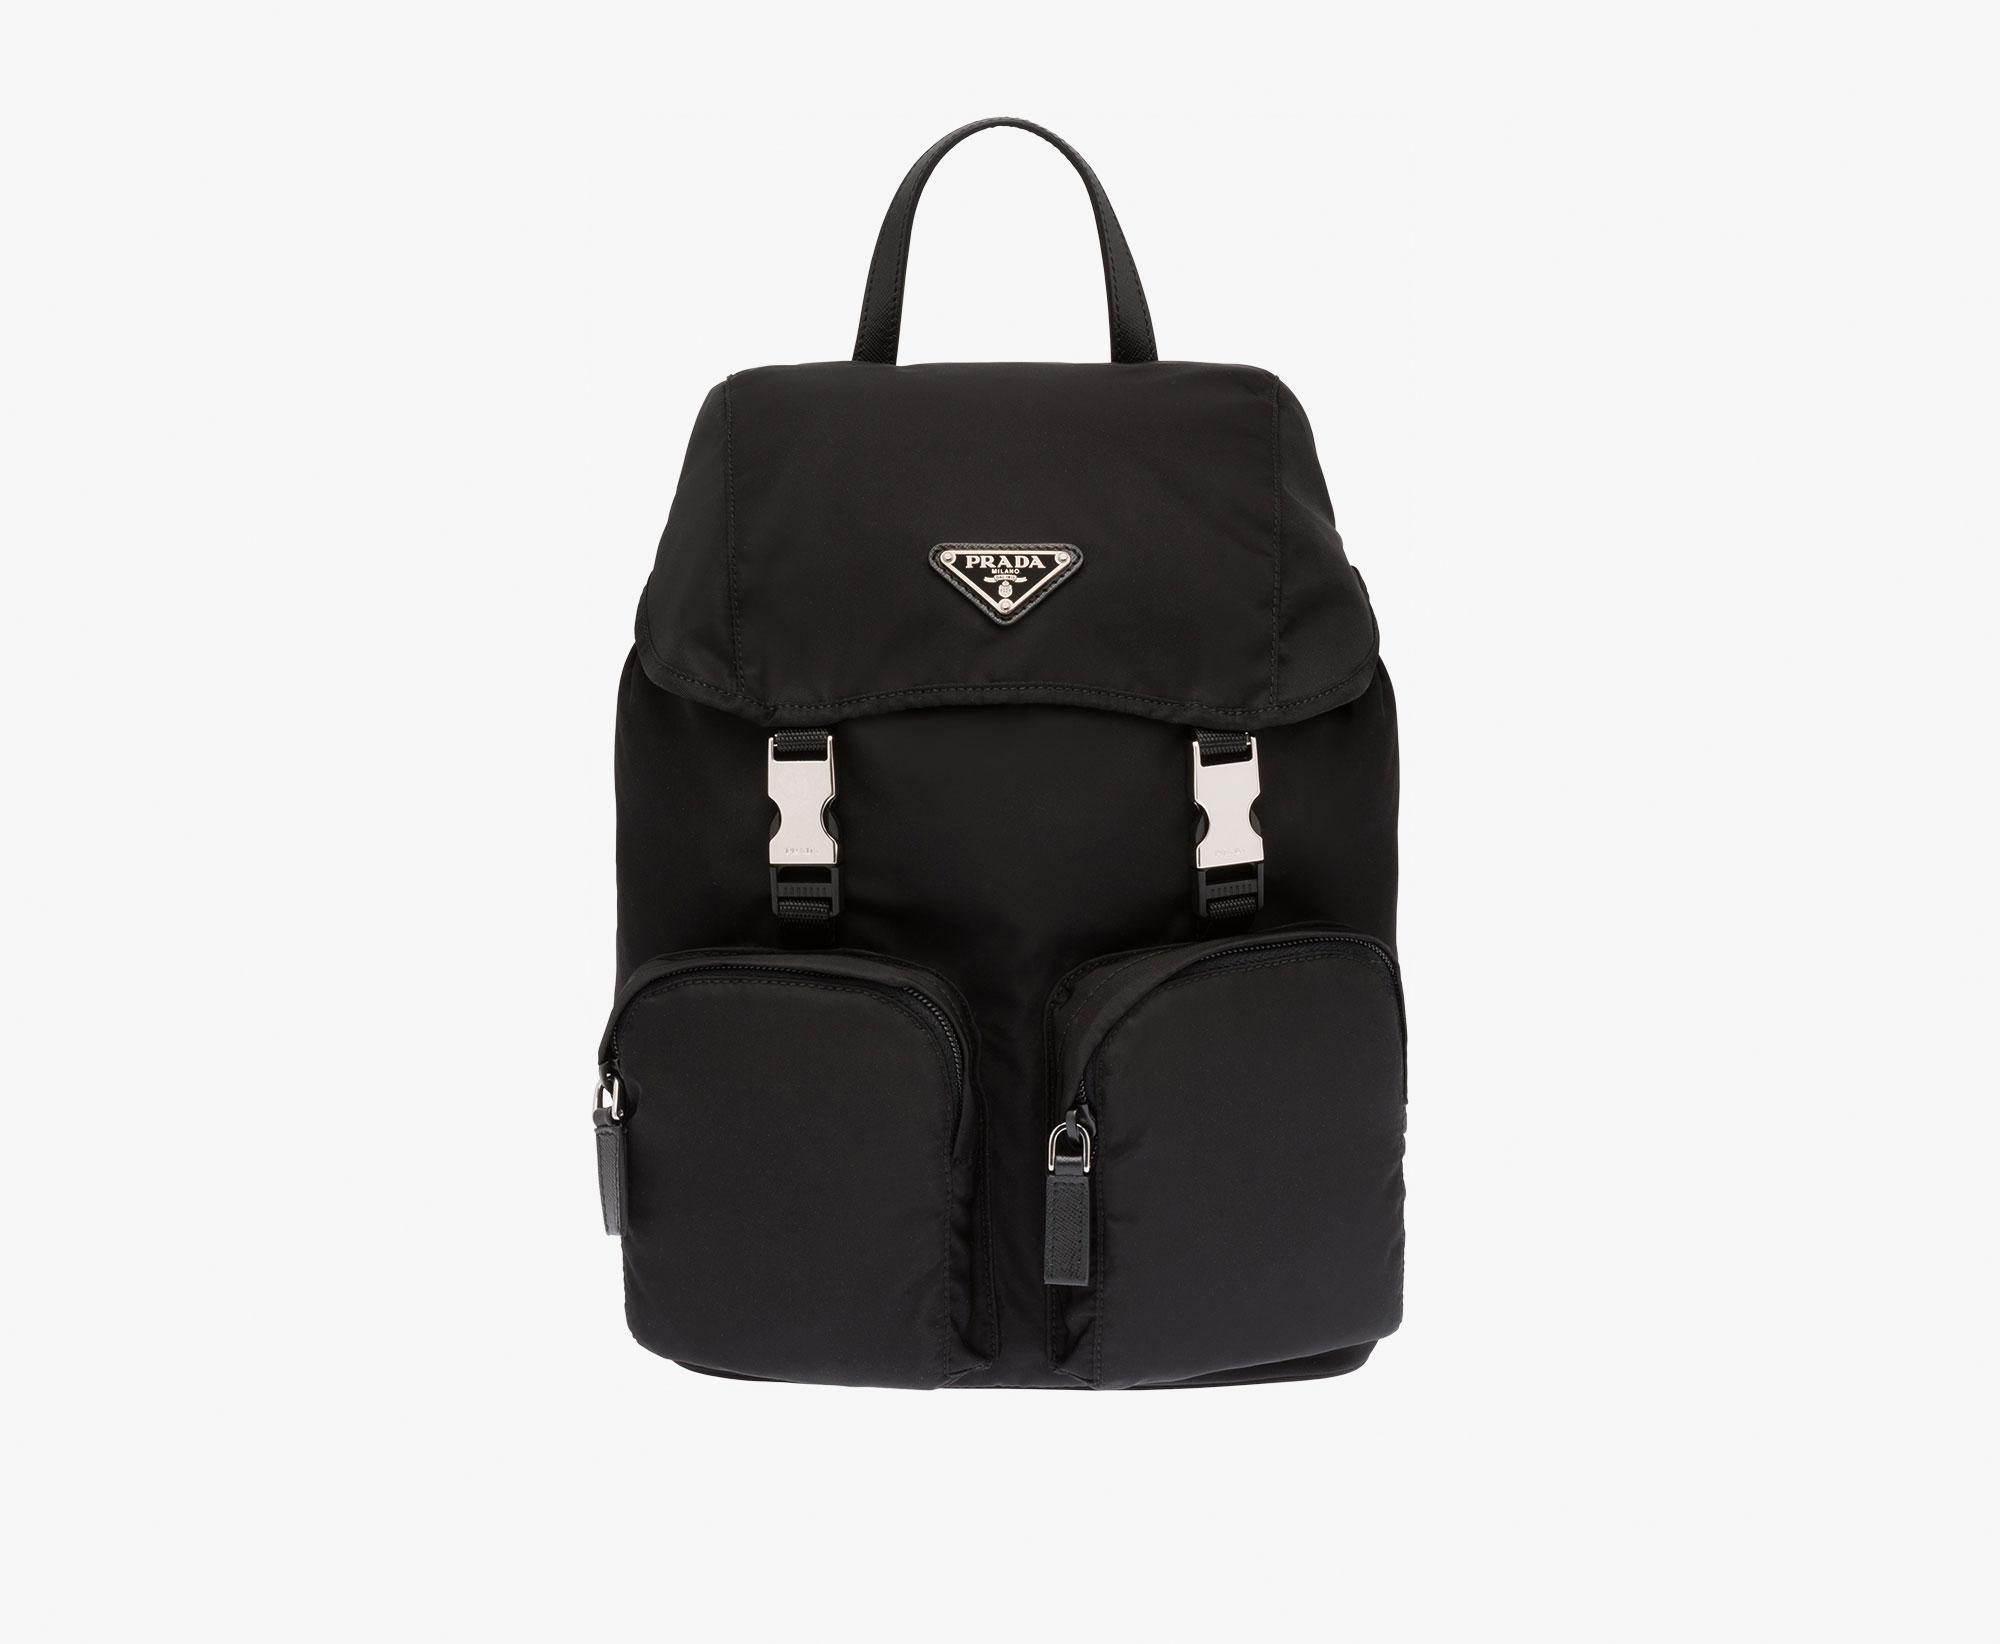 a1af6d79a621 release date prada backpack tessuto tower b0780 48415